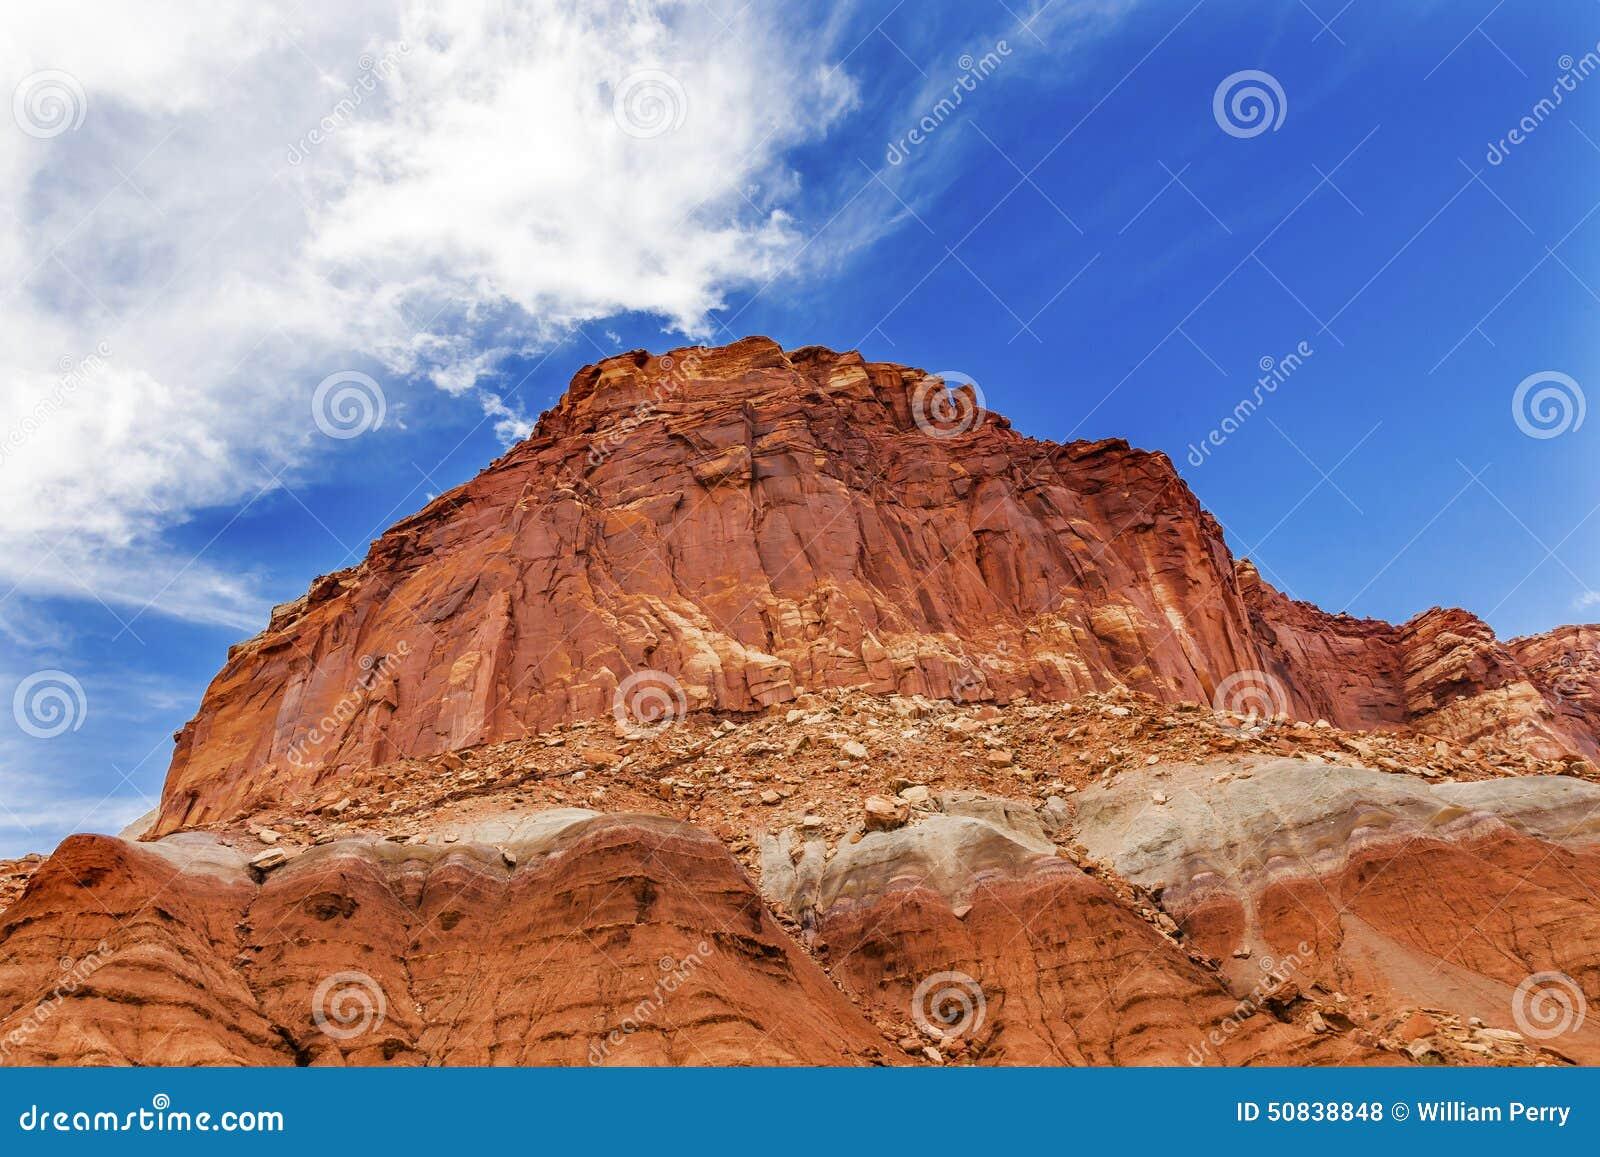 Sandstone Mountain Capitol Reef National Park Utah Stock Photo ...